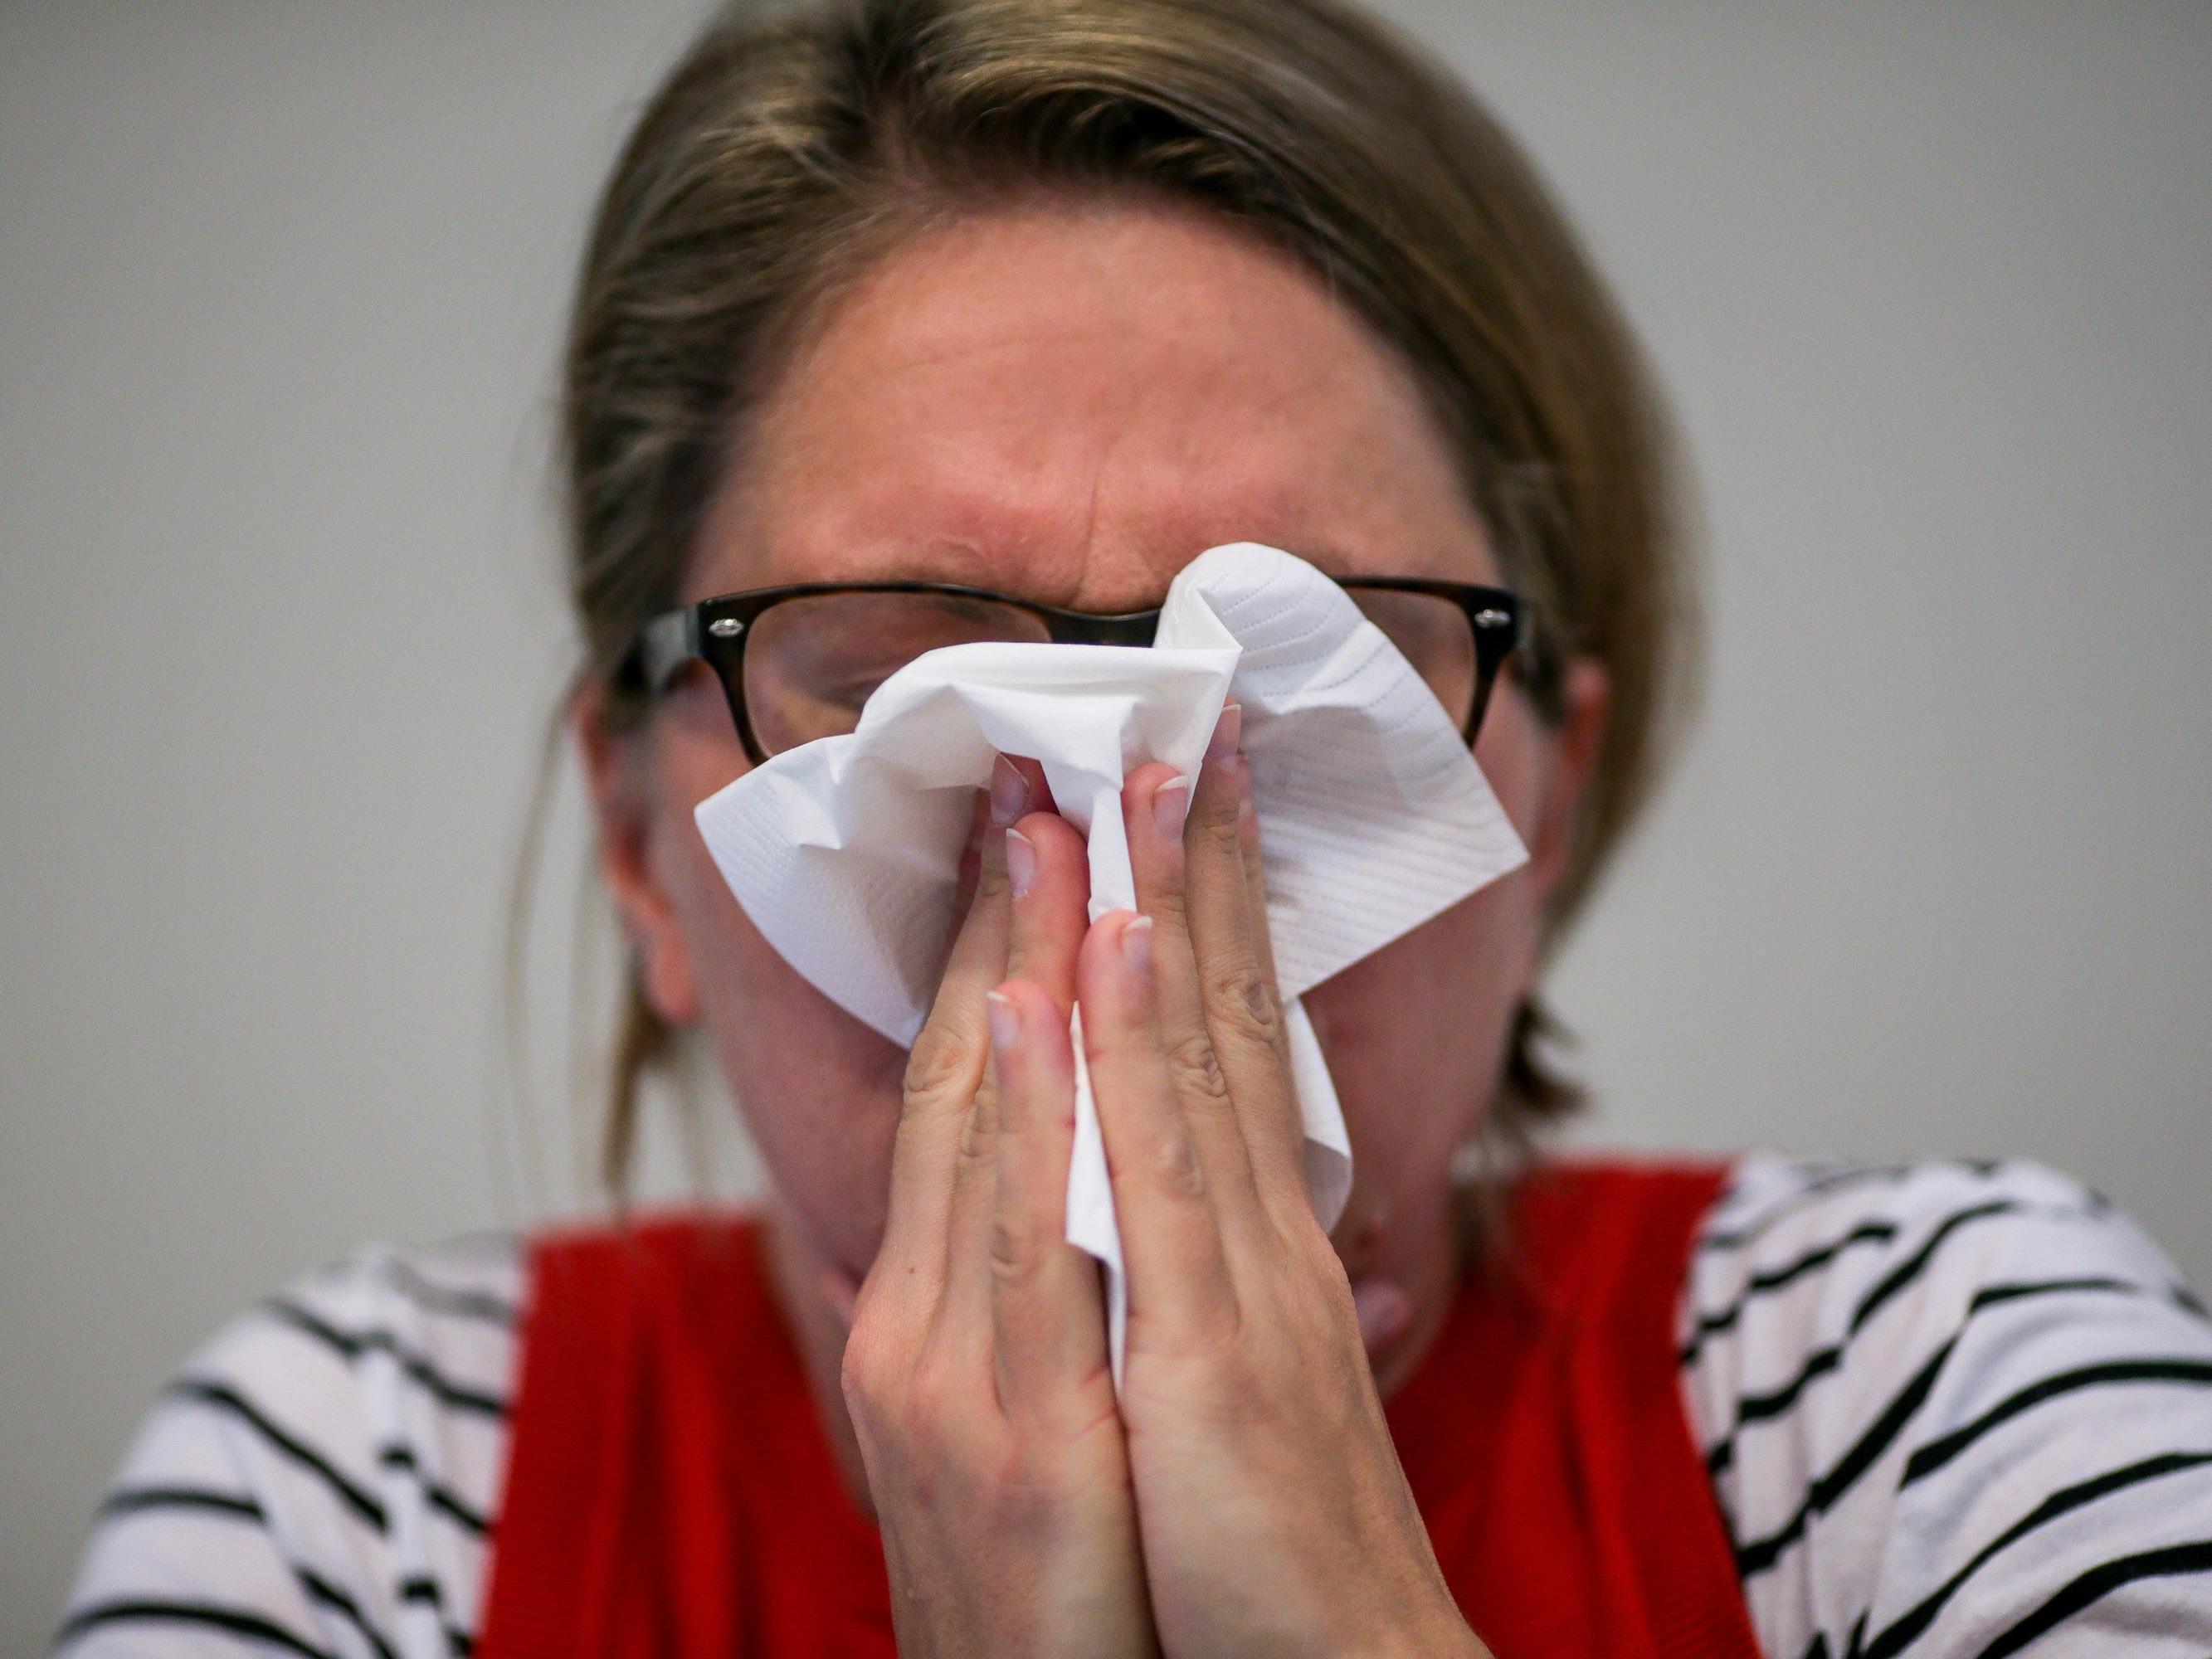 Die Grippewelle ist laut Virologen beendet